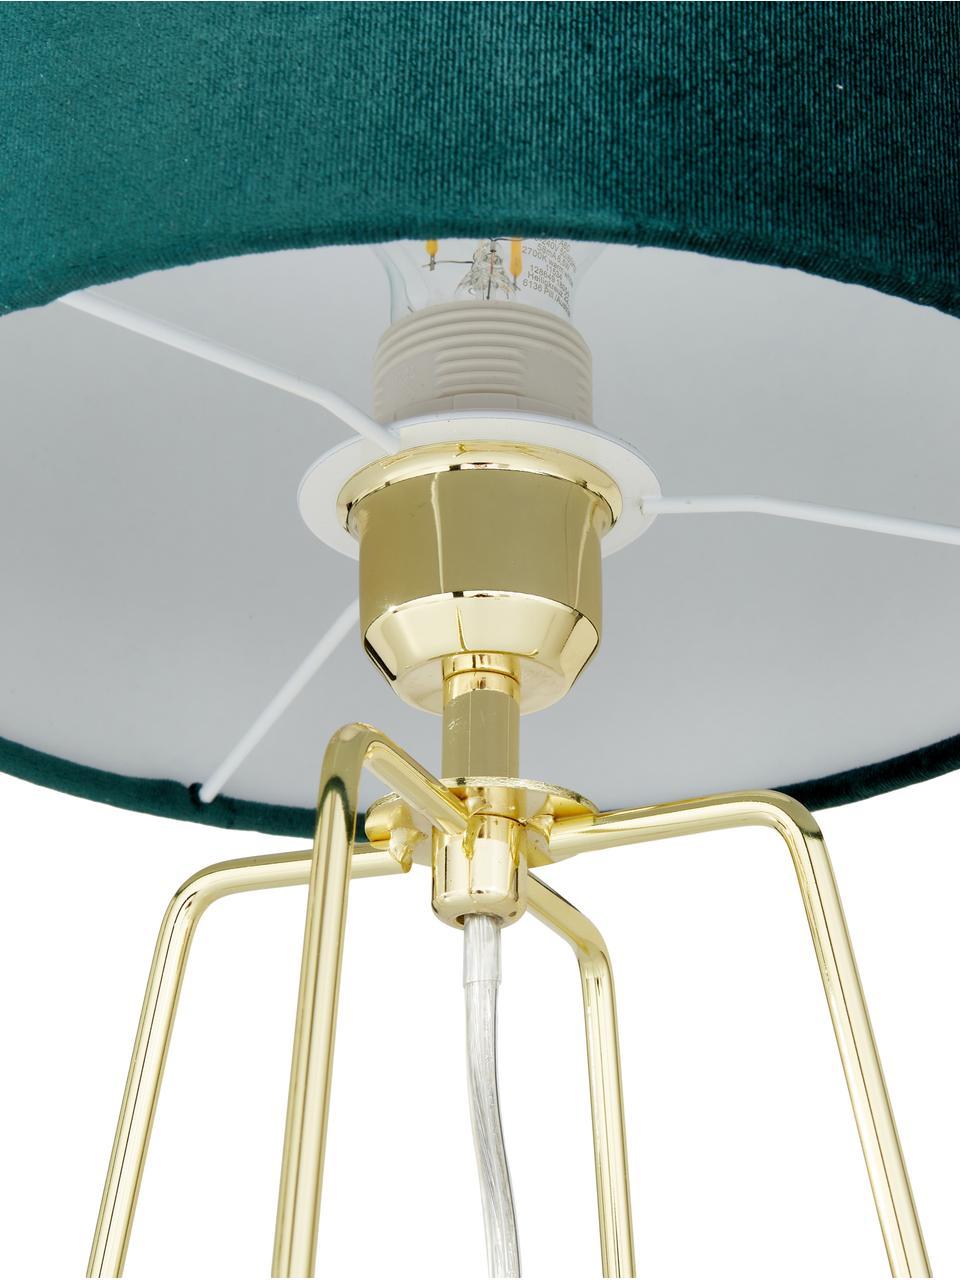 Fluwelen tafellamp Karolina met goudkleurige lampvoet, Lampenkap: fluweel, Lampvoet: vermessingd metaal, Lampenkap: donkergroen.Lampvoet: glanzend messingkleurig.Snoer: transparant, Ø 25 x H 49 cm